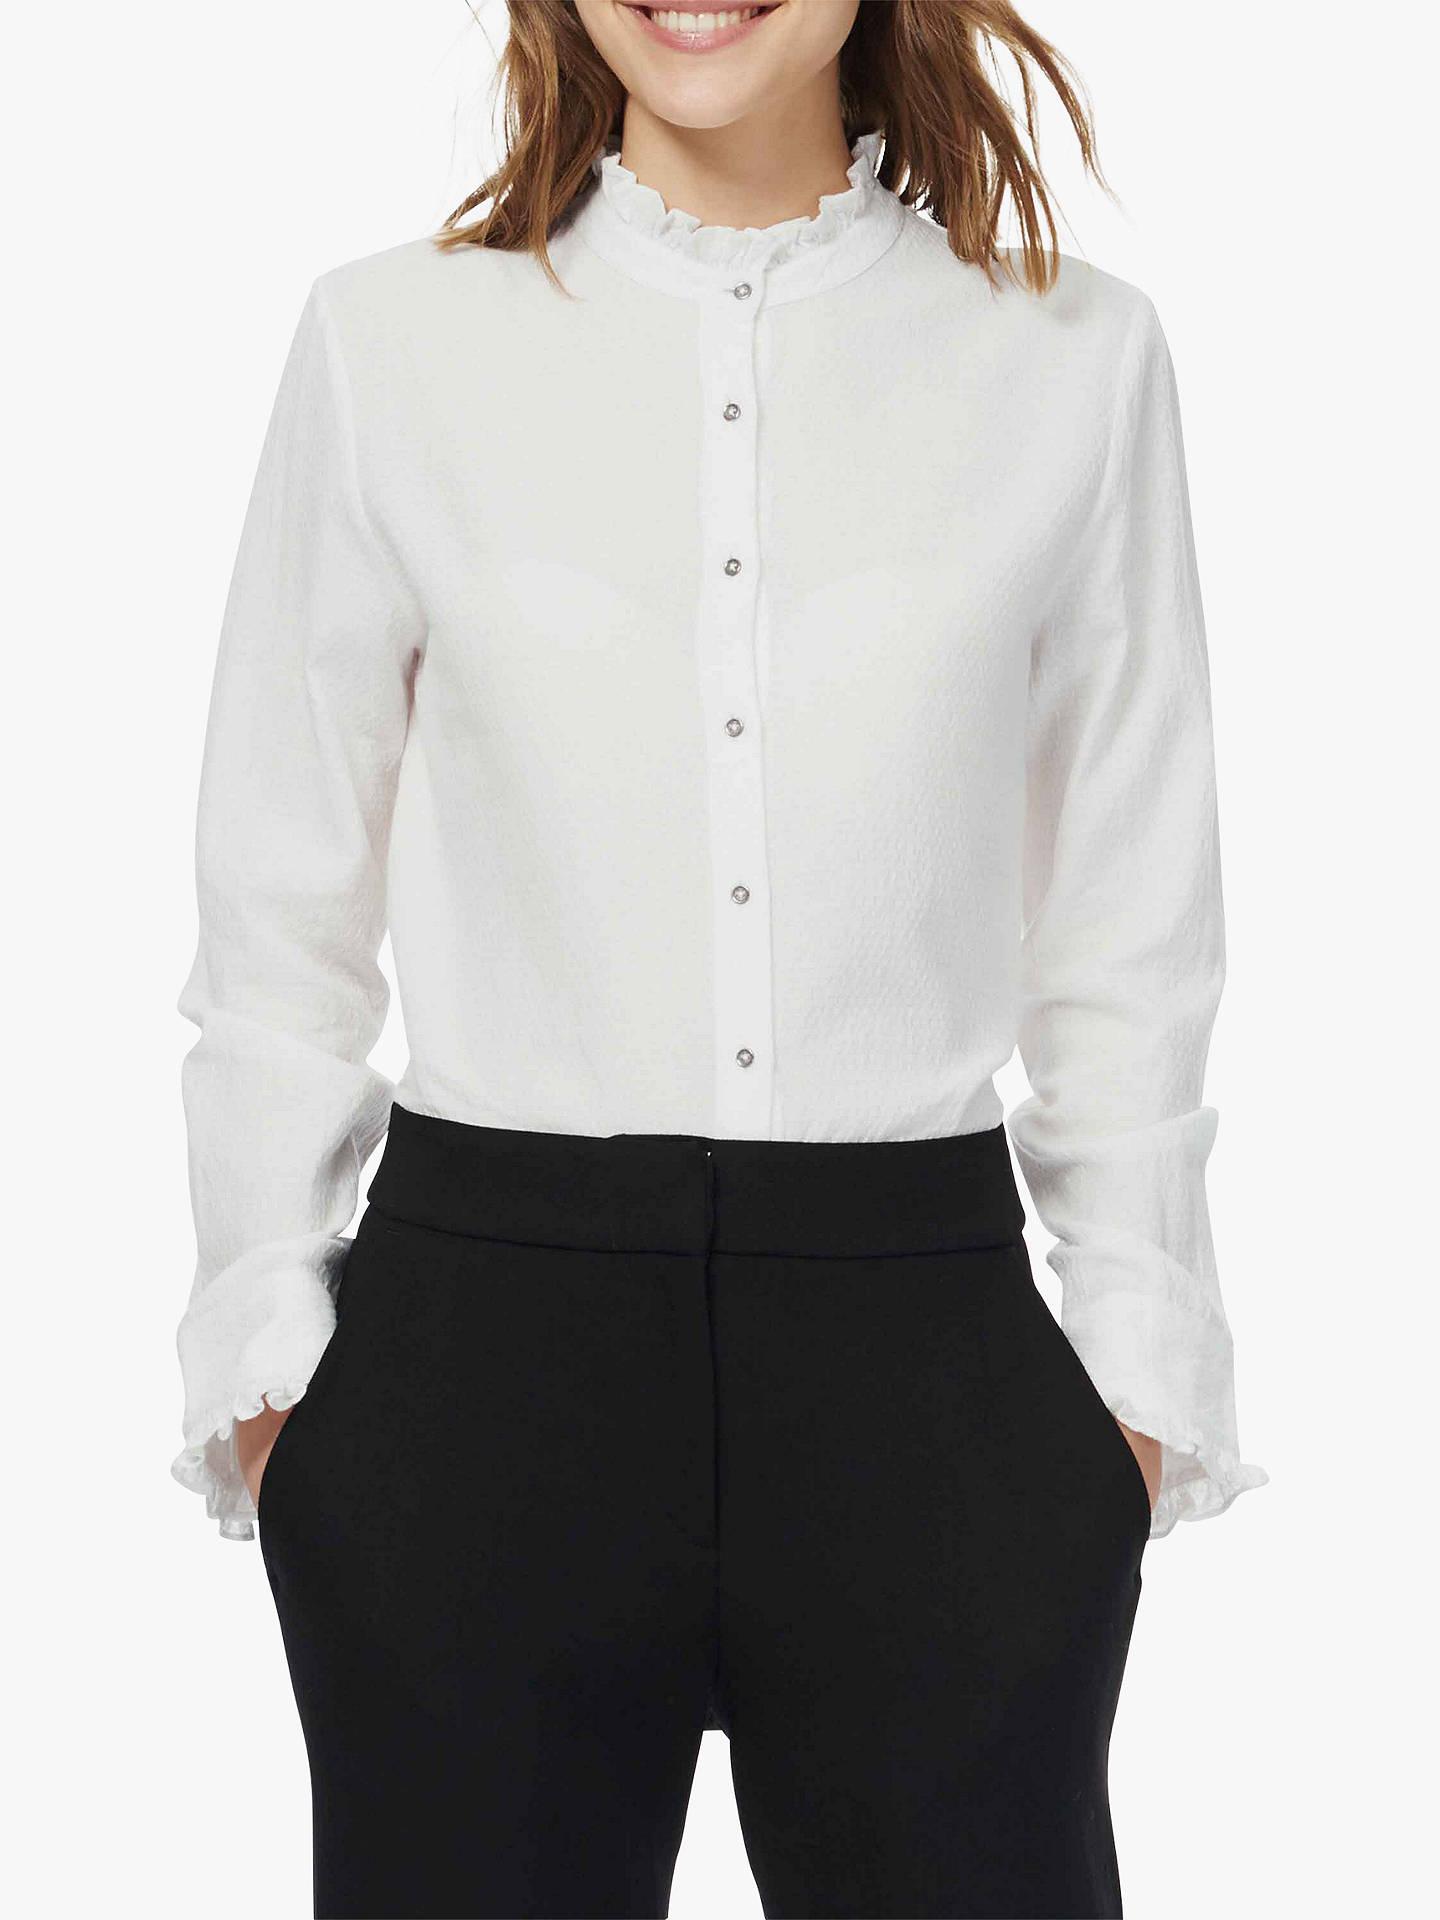 8198f0e88db229 Buy Brora Textured Cotton Frill Shirt, White, 6 Online at johnlewis.com ...